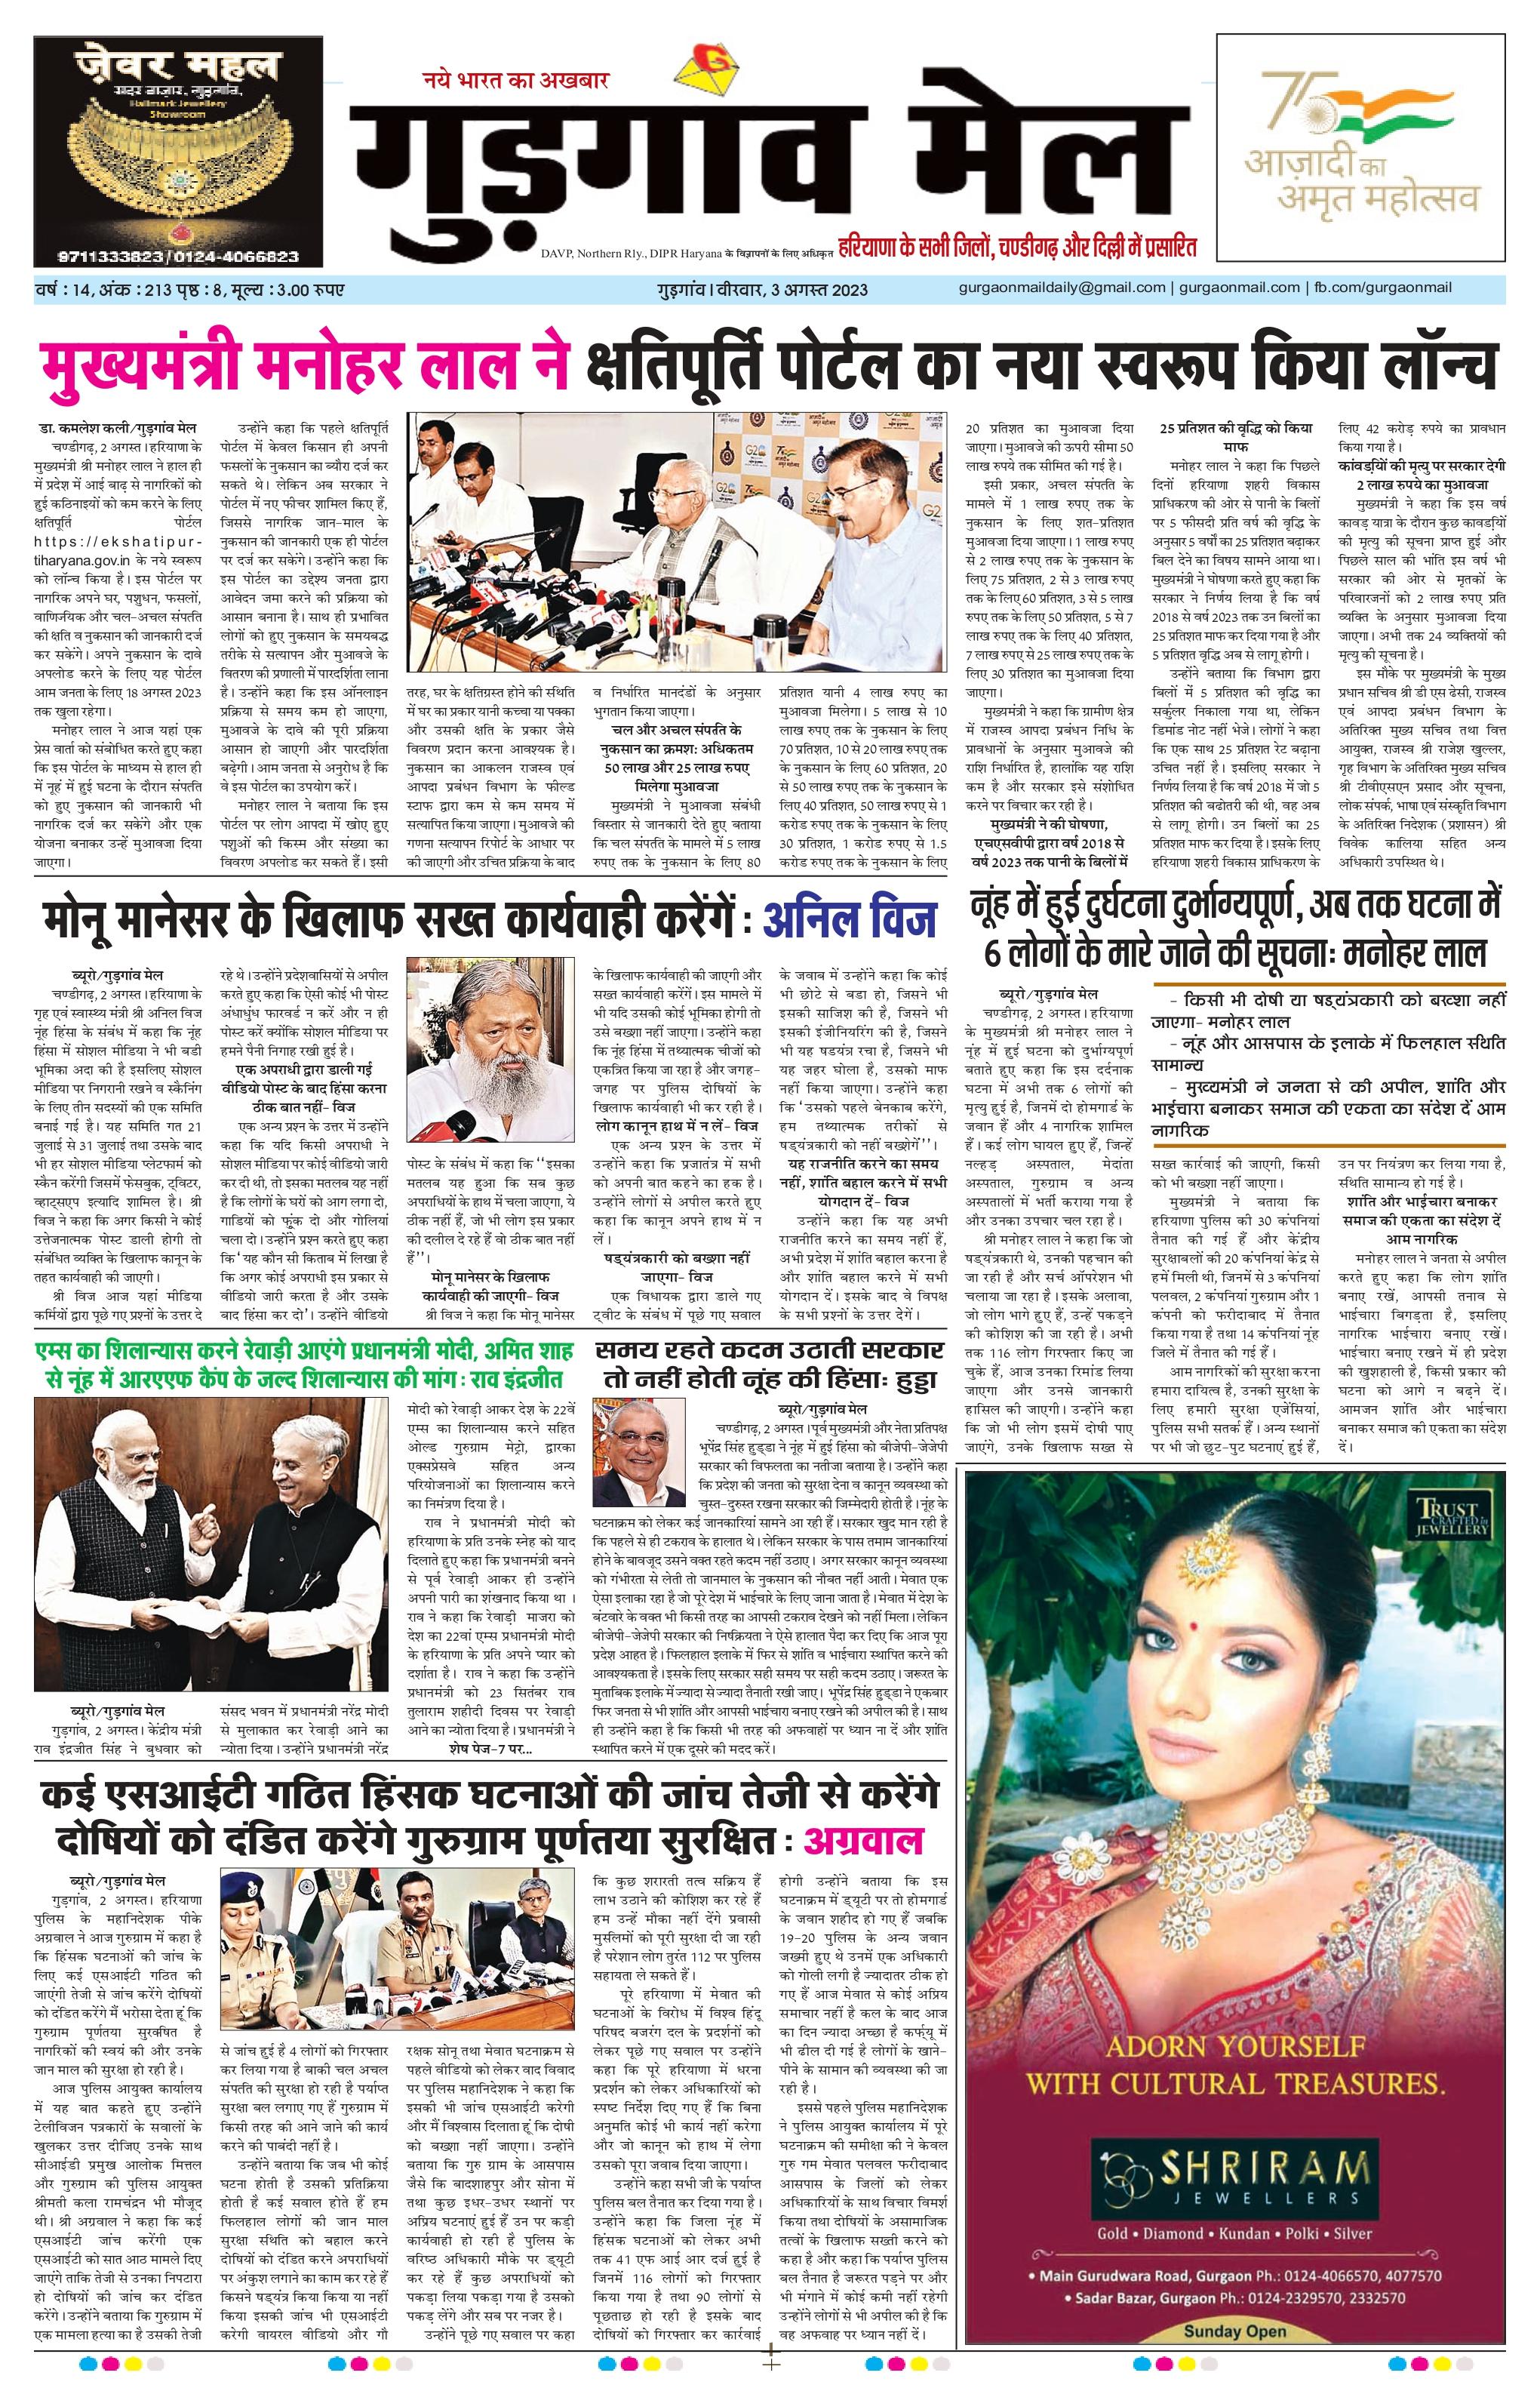 Gurgaon Mail | ePaper | Leading Newspaper In Haryana NCR